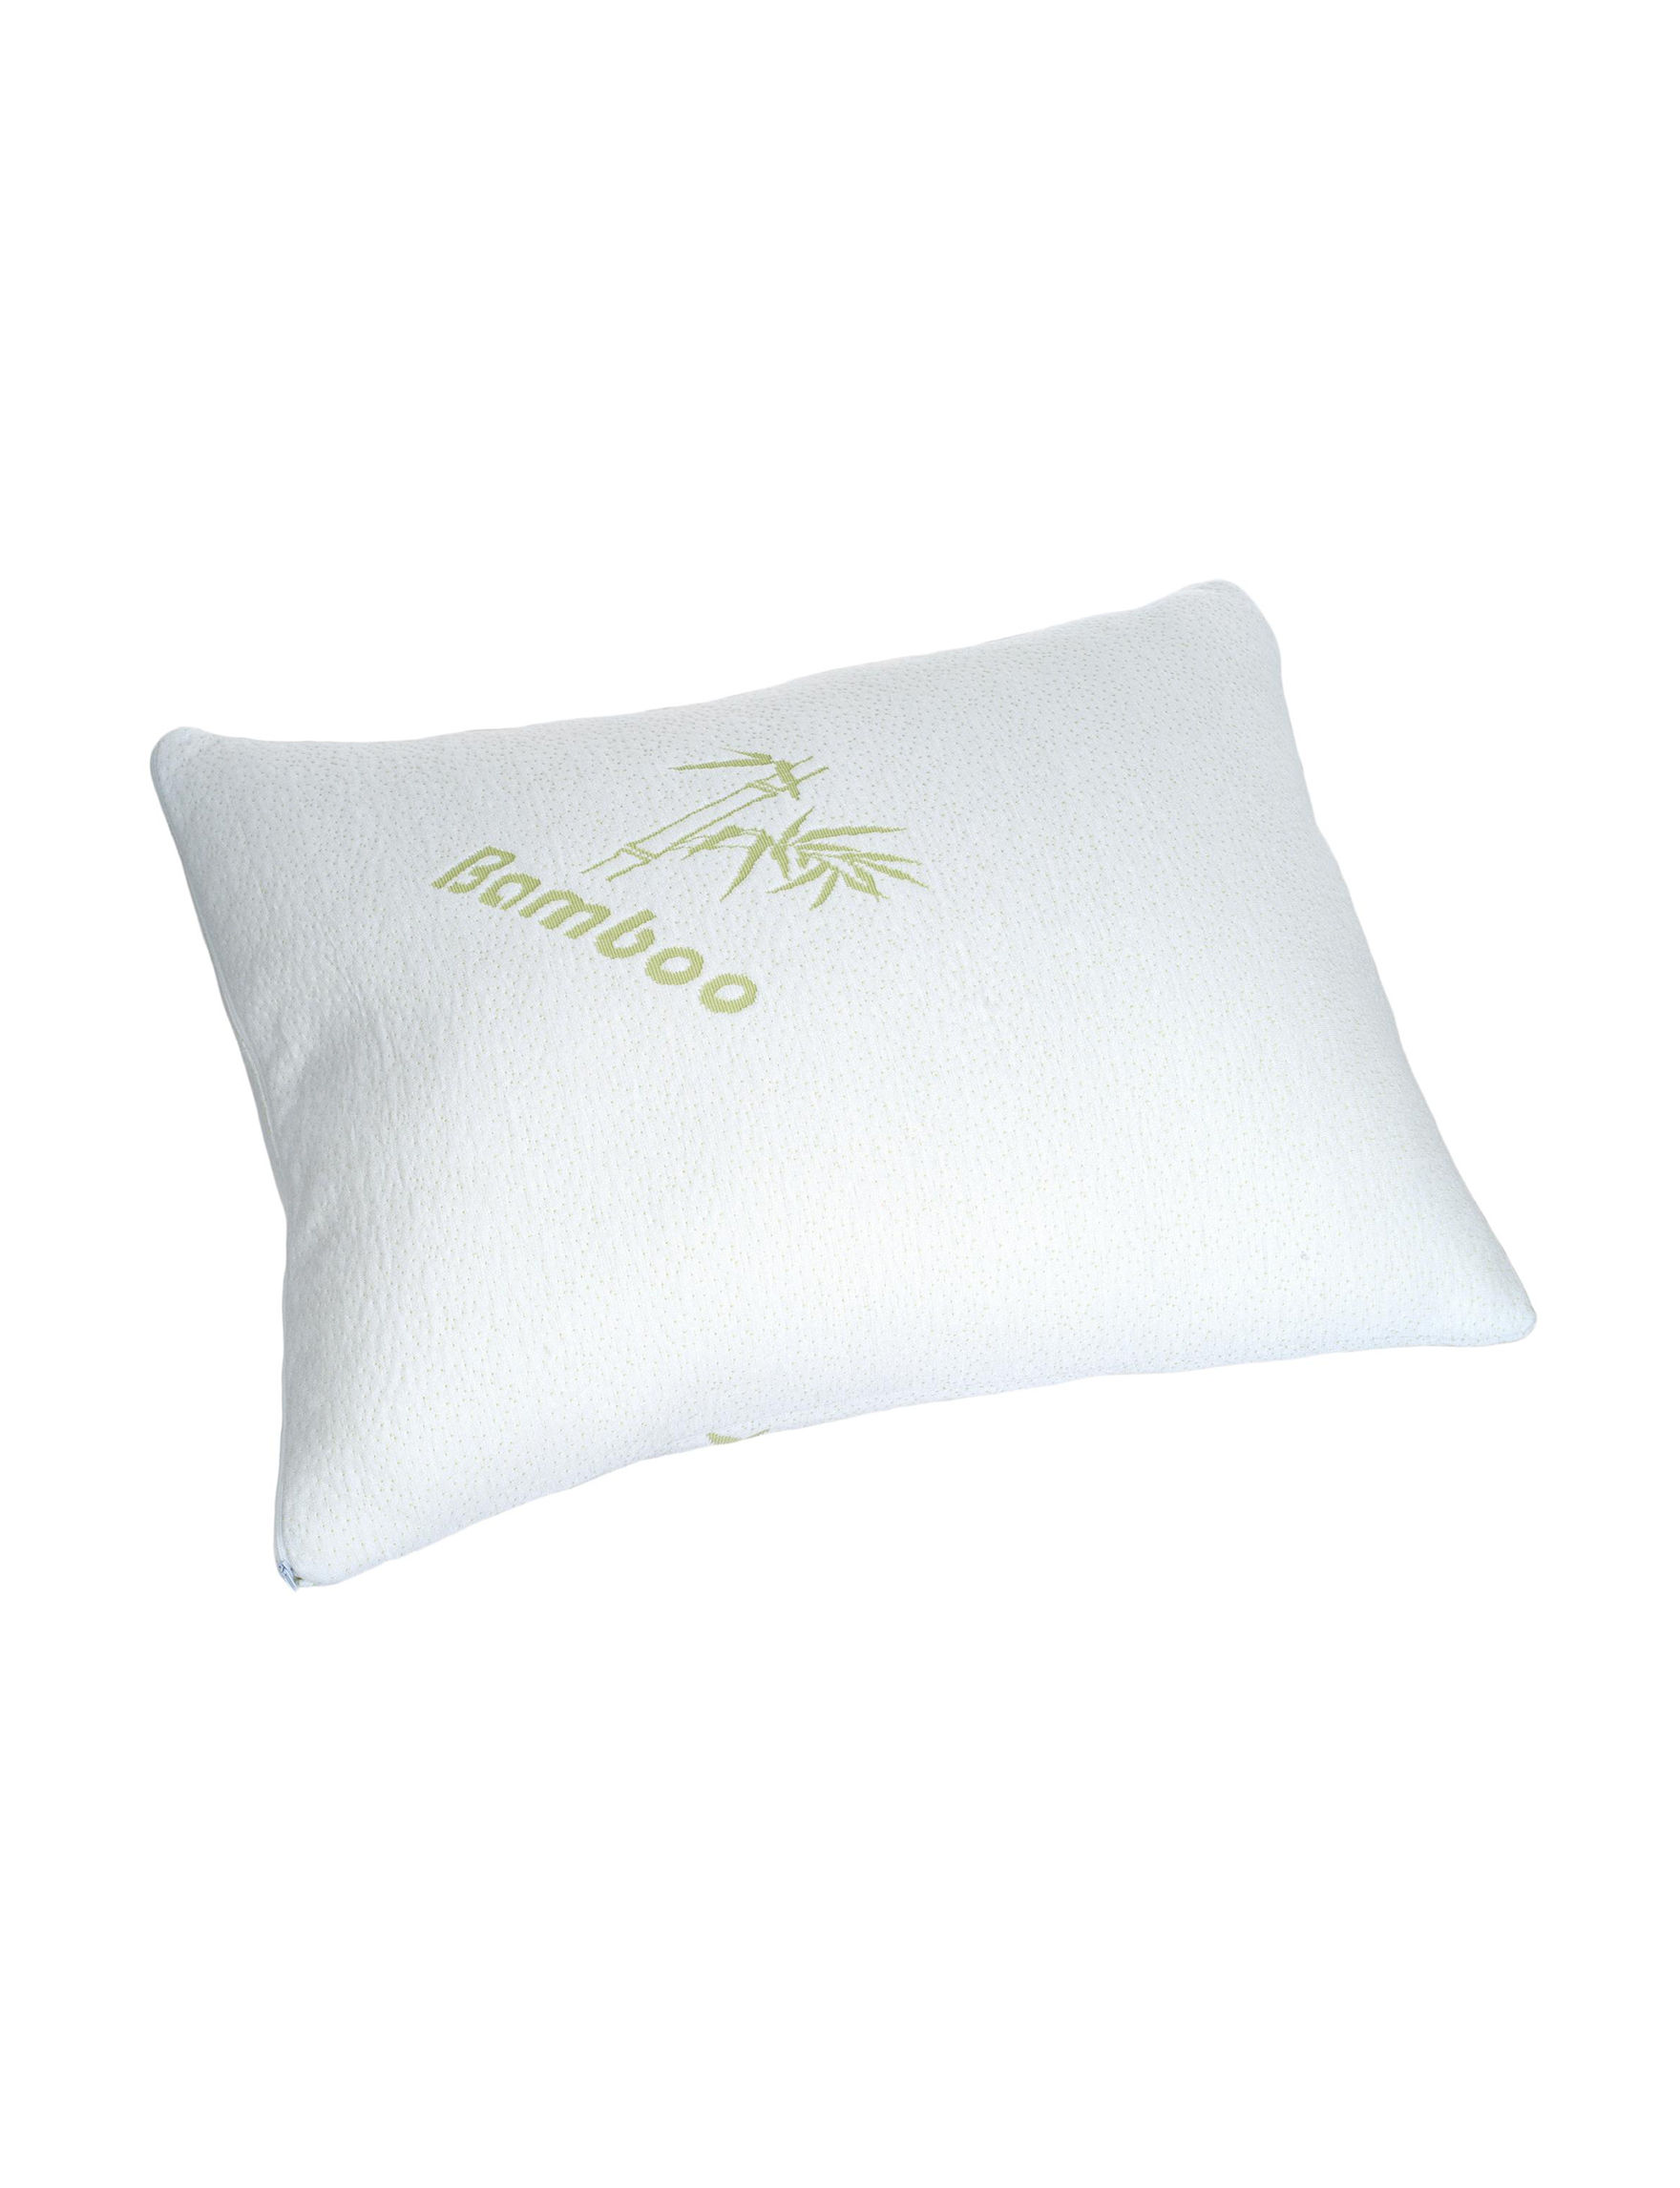 Lavish Home White Bed Pillows